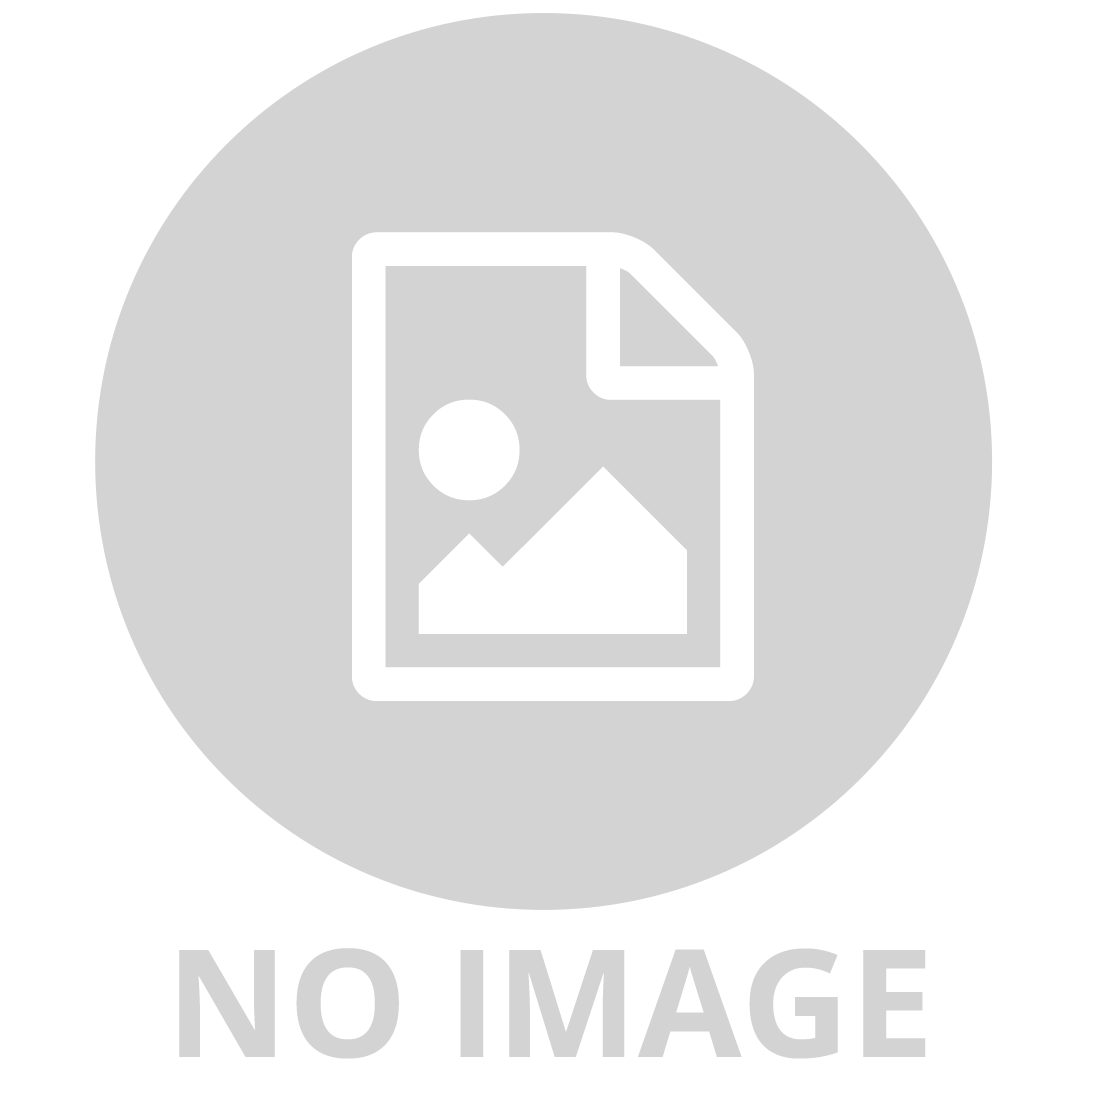 COLORADO PRIMAL 2 BMX PUSH BIKE 20 - BLUE